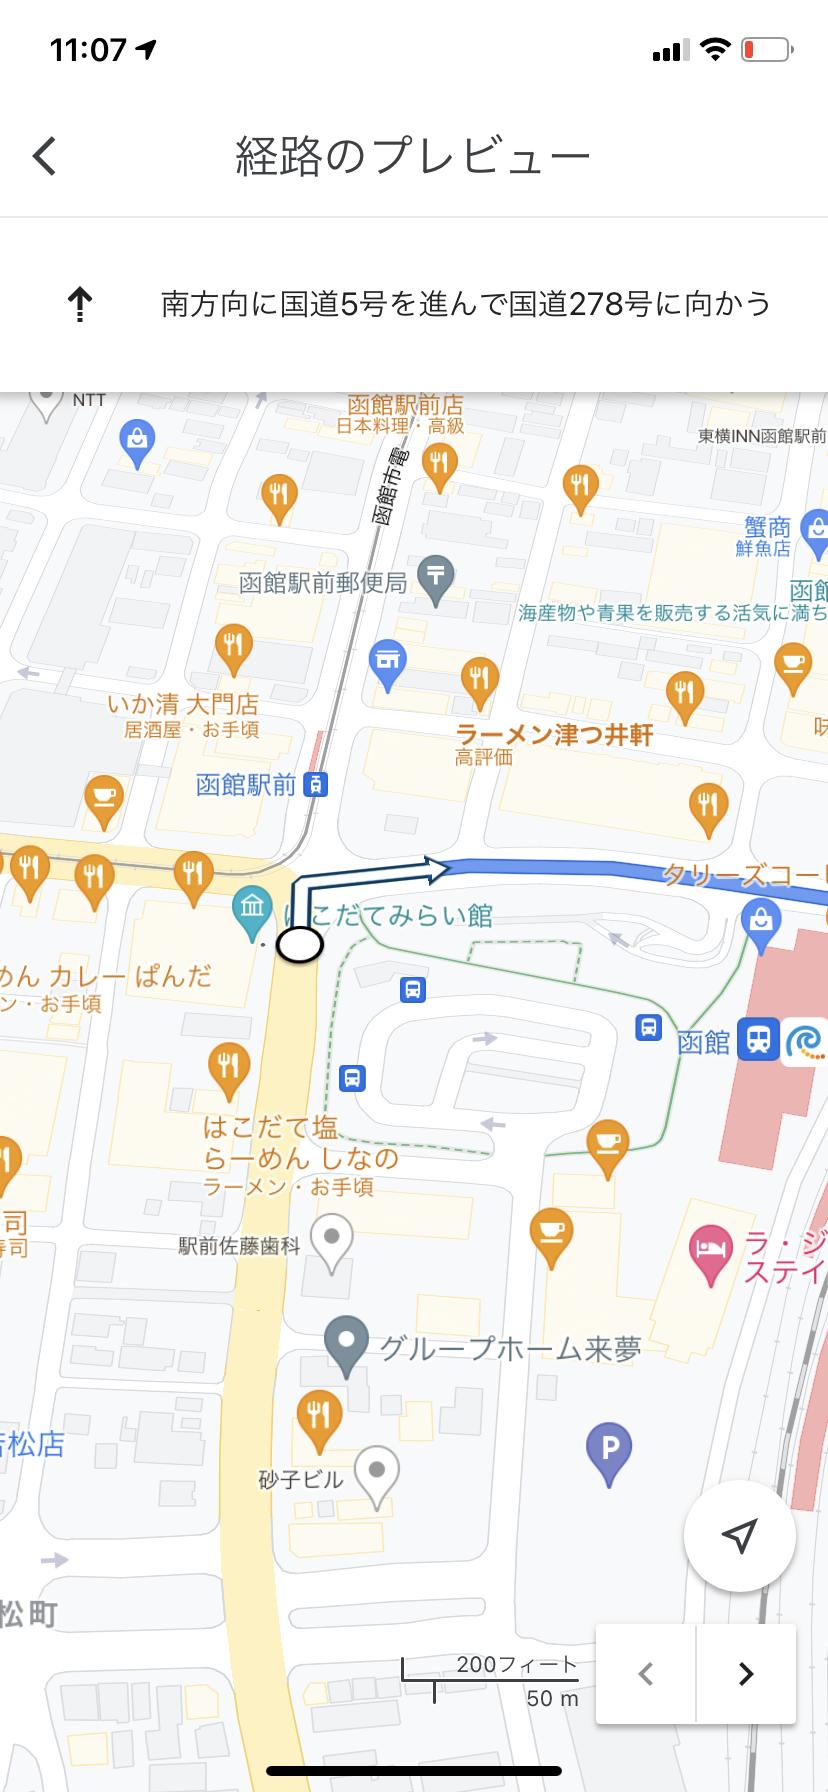 Google(グーグル)Google マップを使ったヨコさんのクチコミ画像1